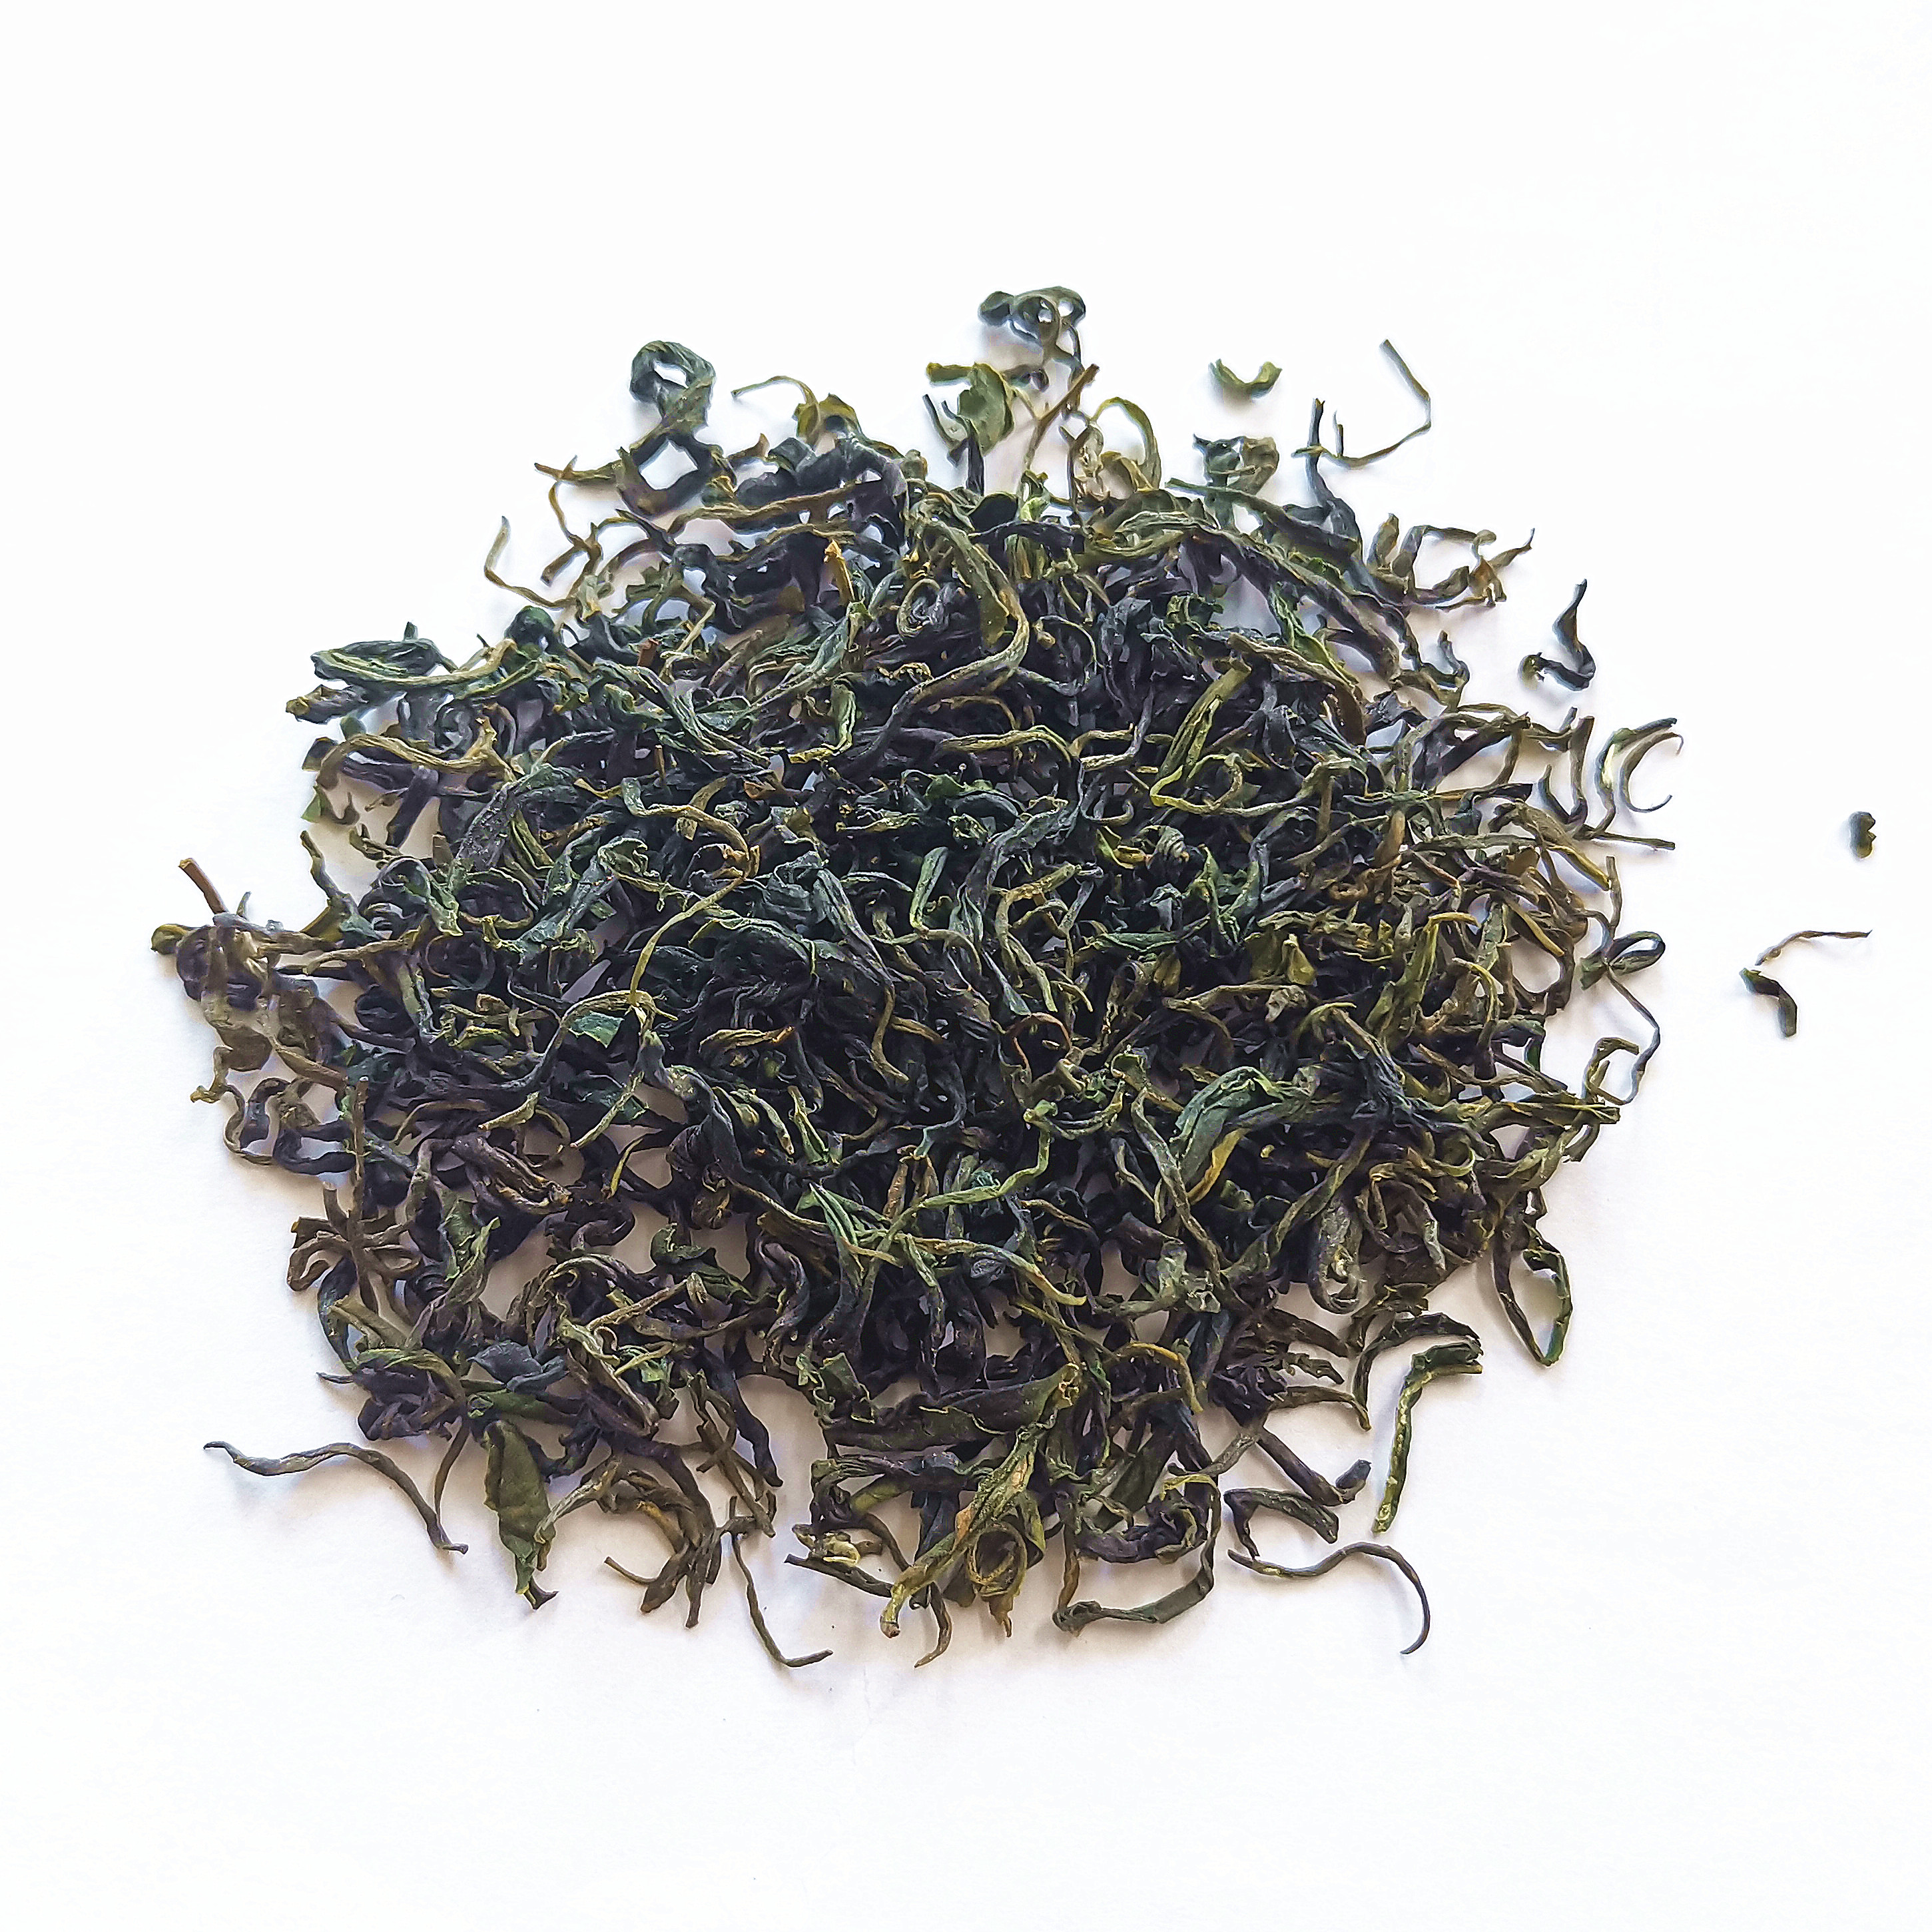 Best online tea store China lower blood pressure tea green - 4uTea | 4uTea.com